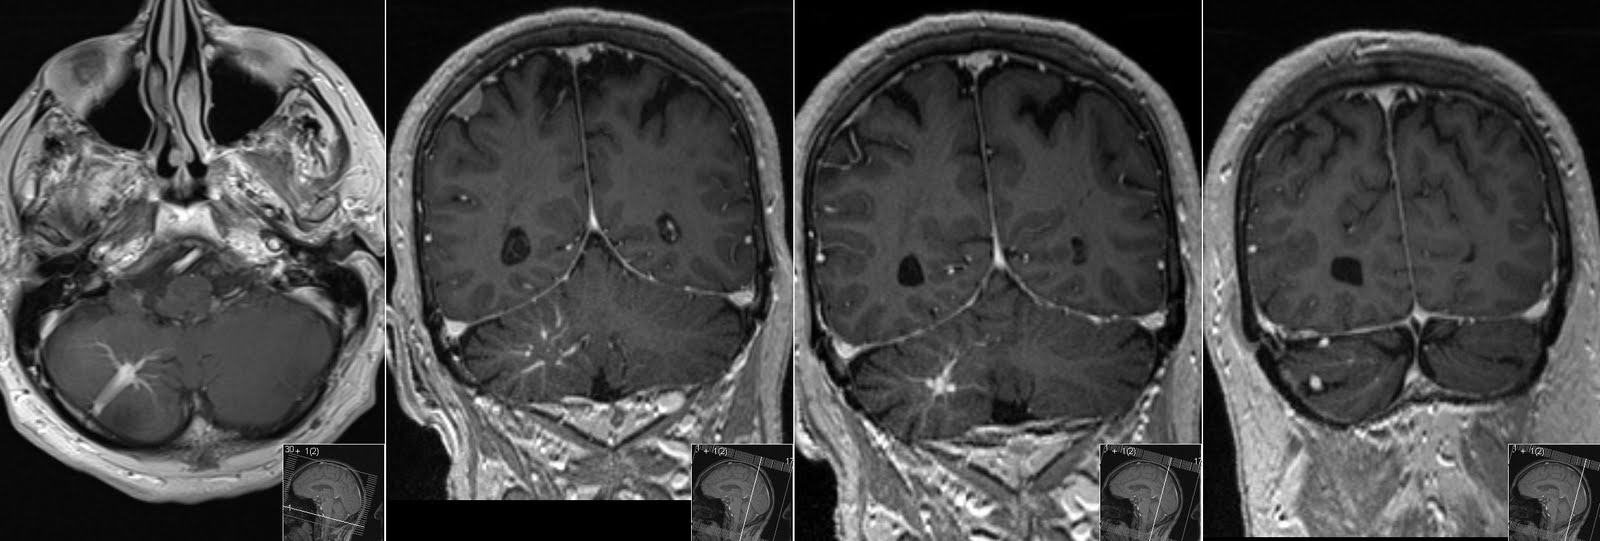 Radiology Mri Developmental Venous Anomaly